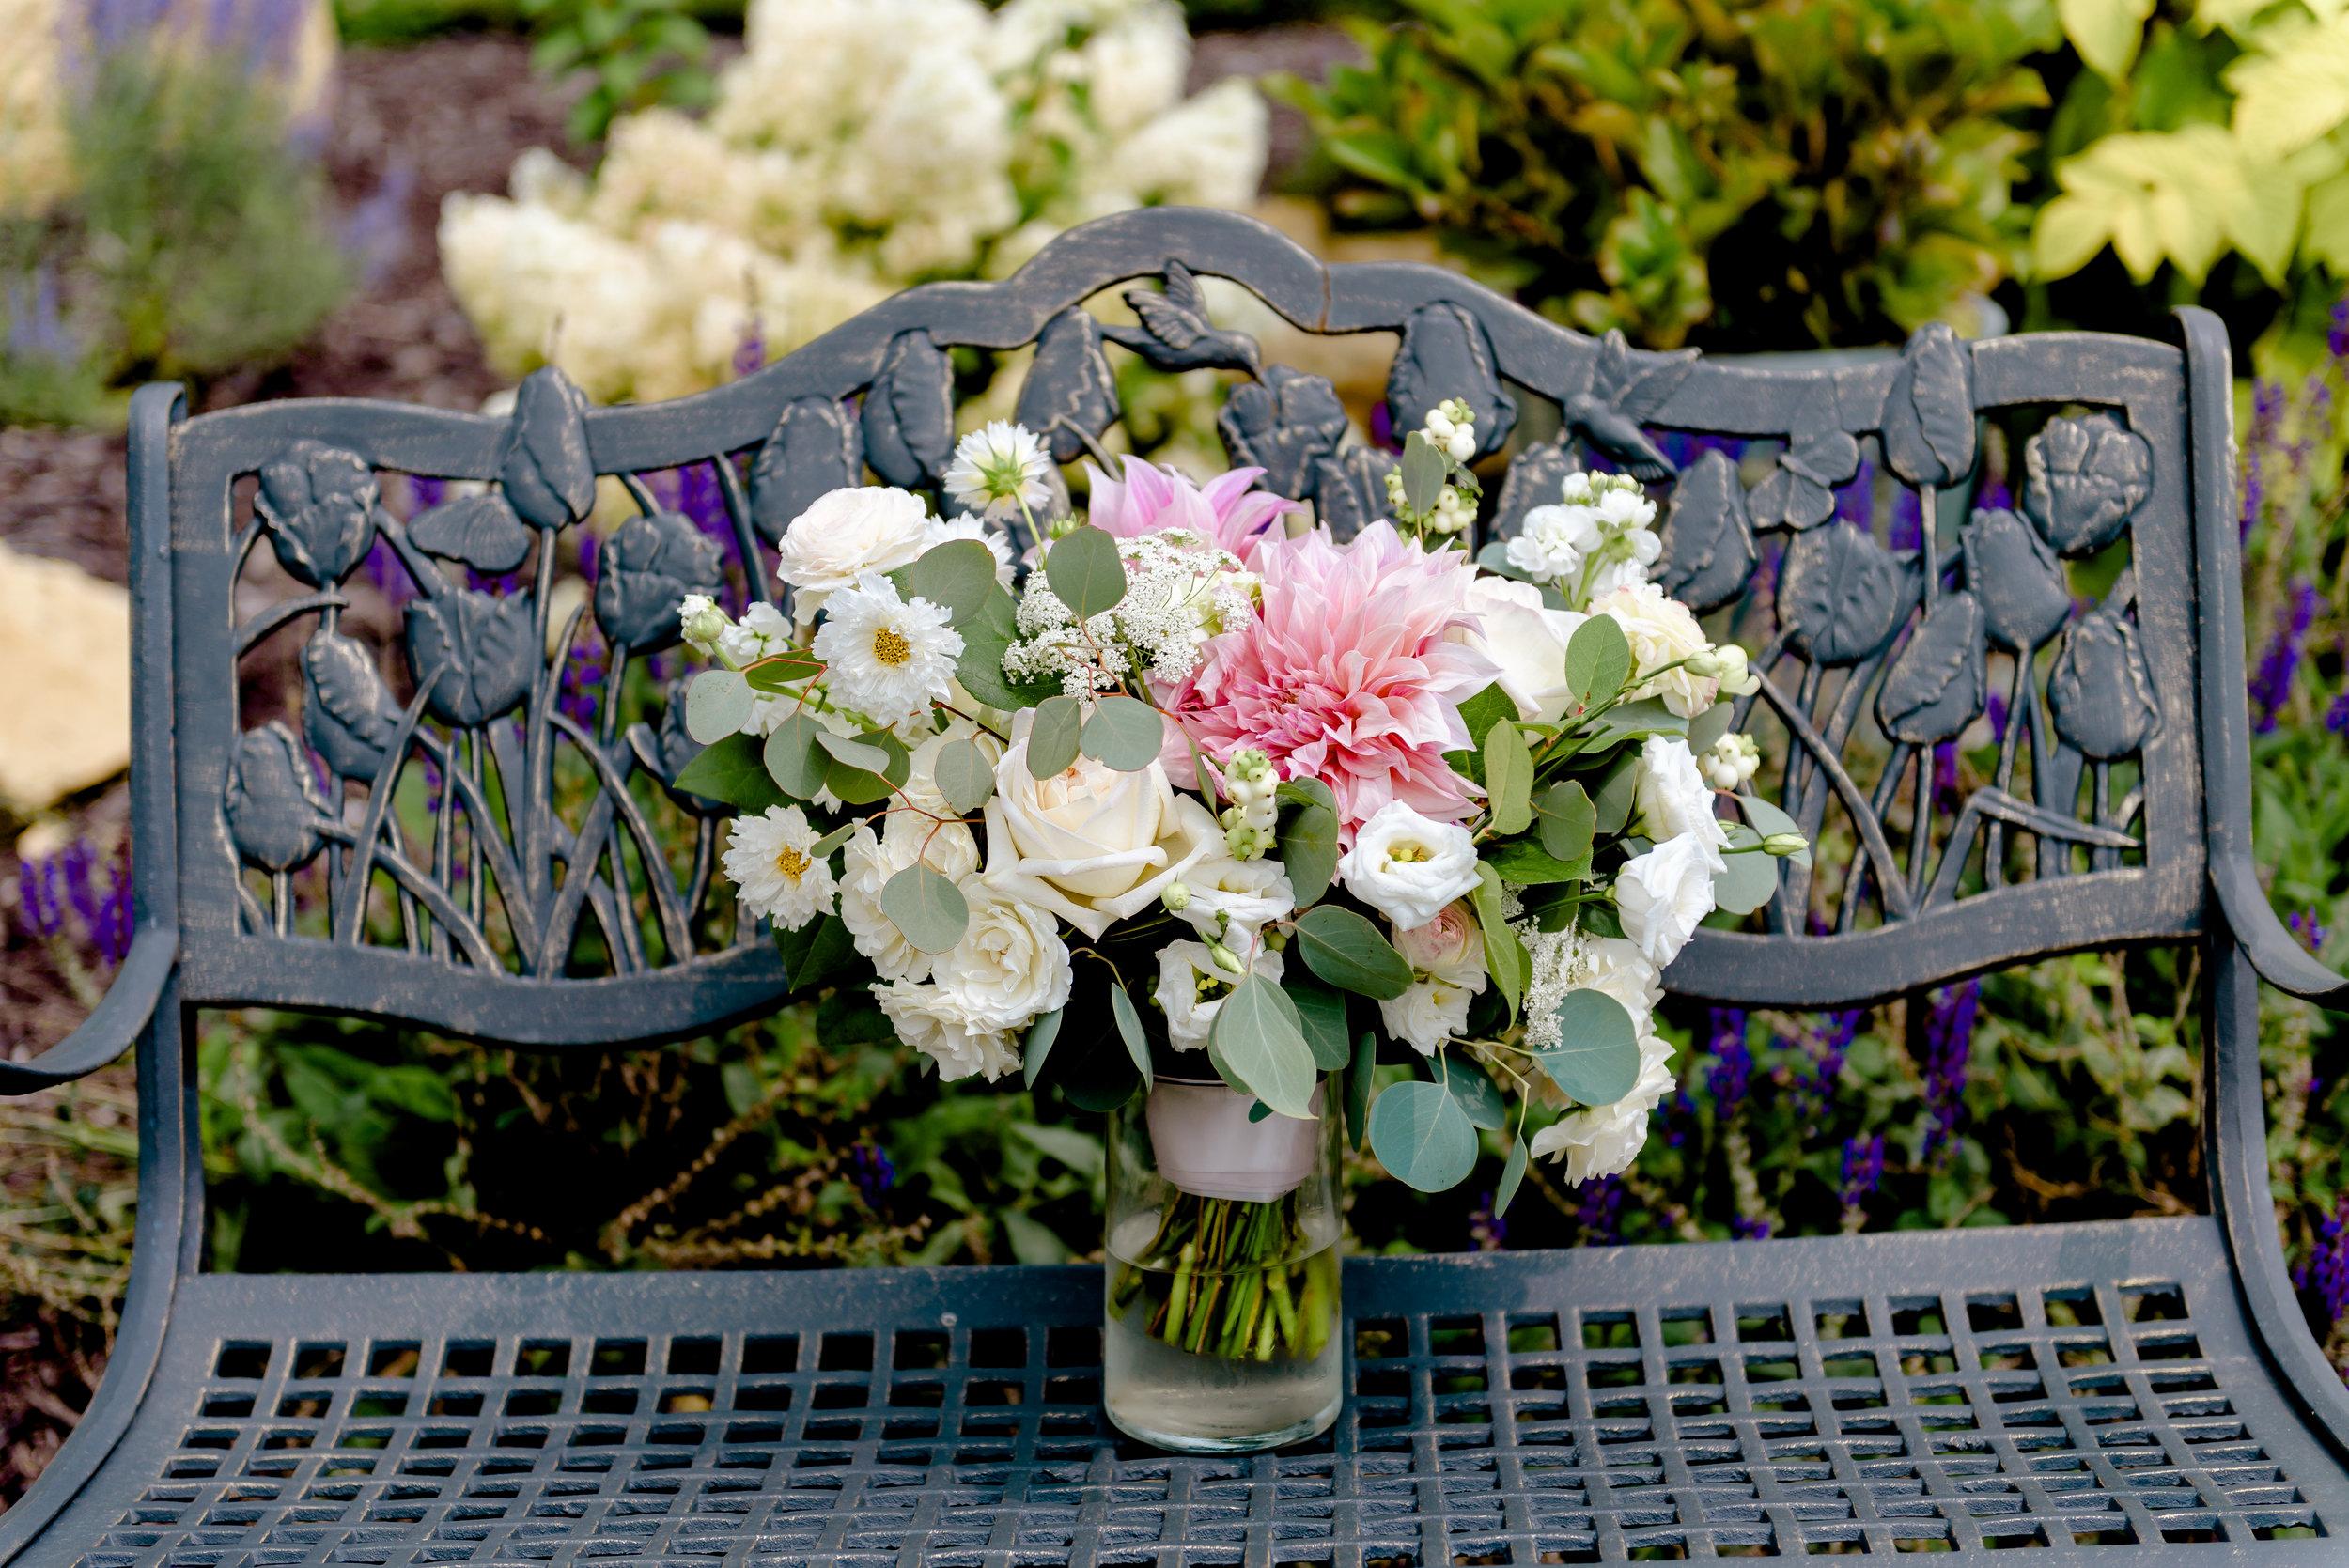 Studio Fleurette Bouquet at Legacy Hill Farm - MN Wedding Photography